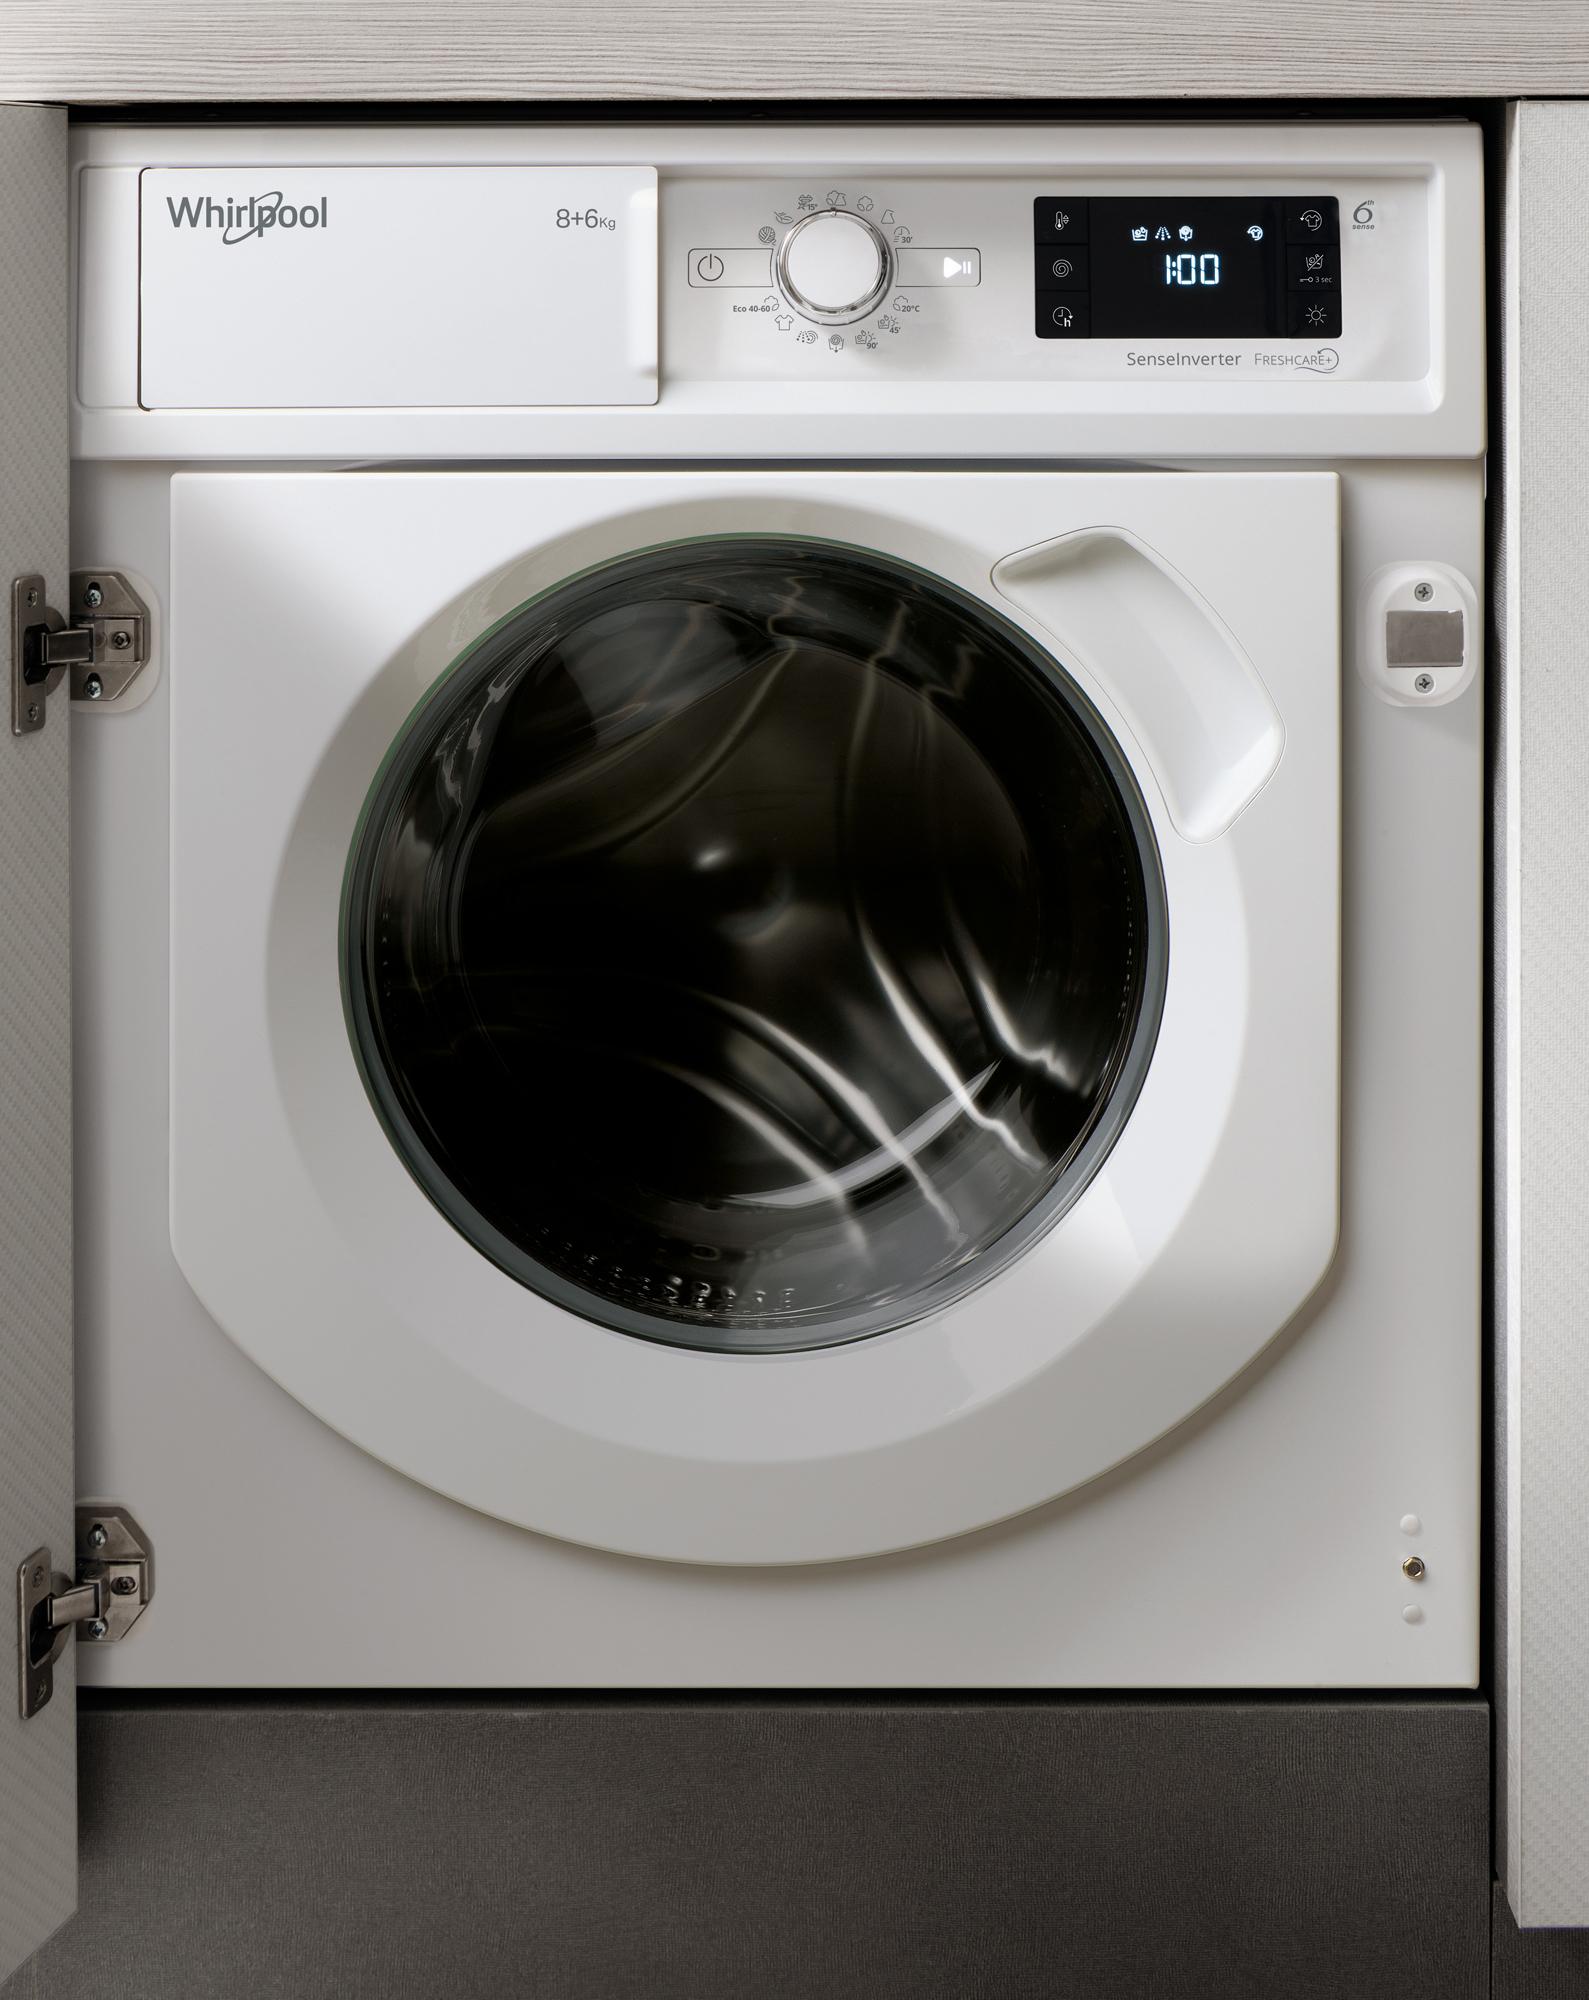 Lavasecadora Whirlpool WDWG861484EU Integ 8+6kg